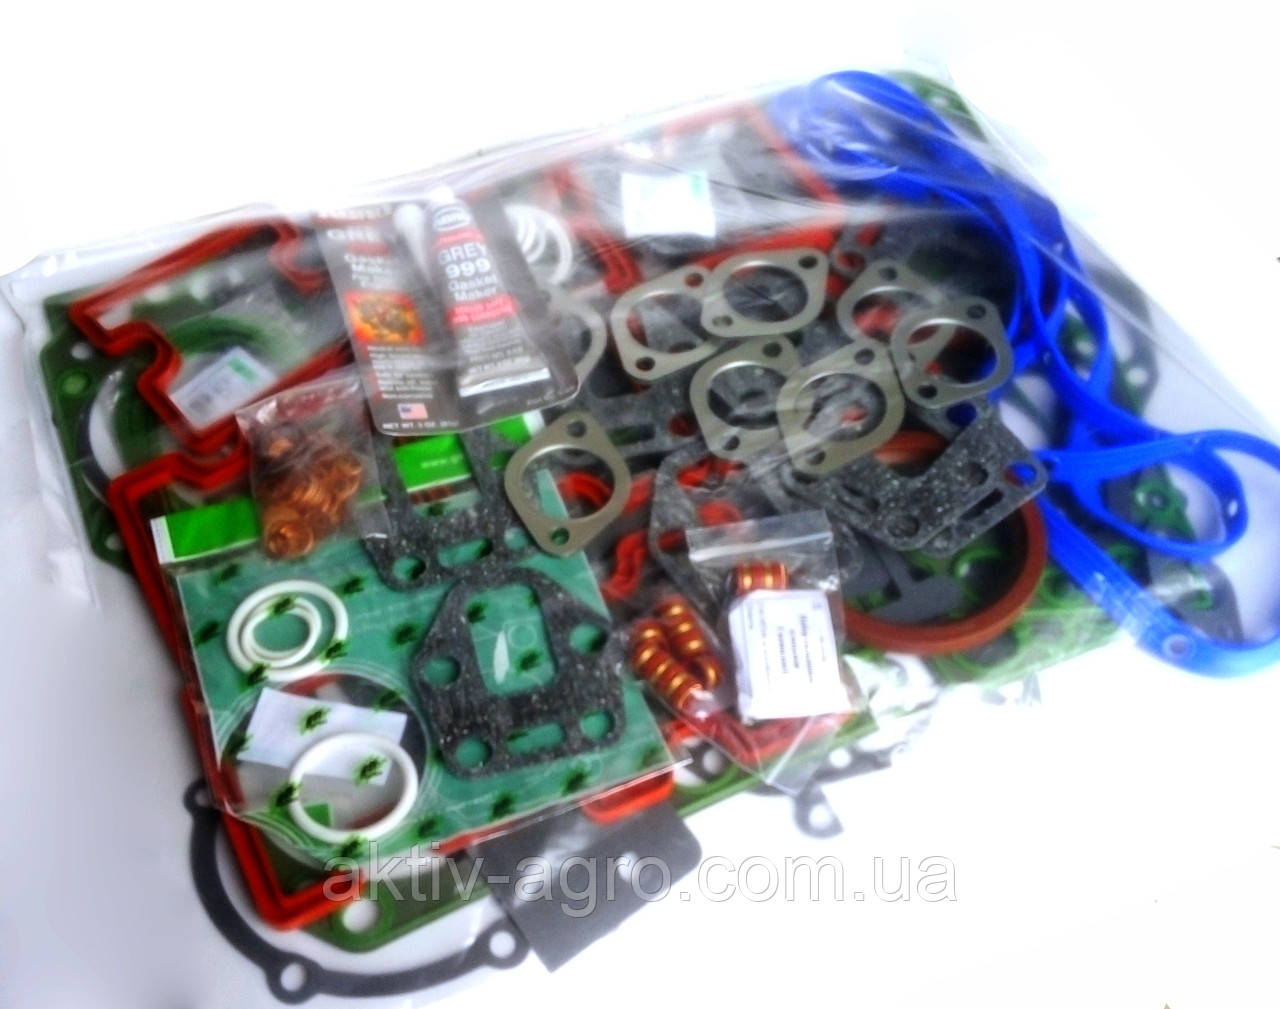 Комплект прокоадок для ремонта двигателя КамАЗ Евро-2